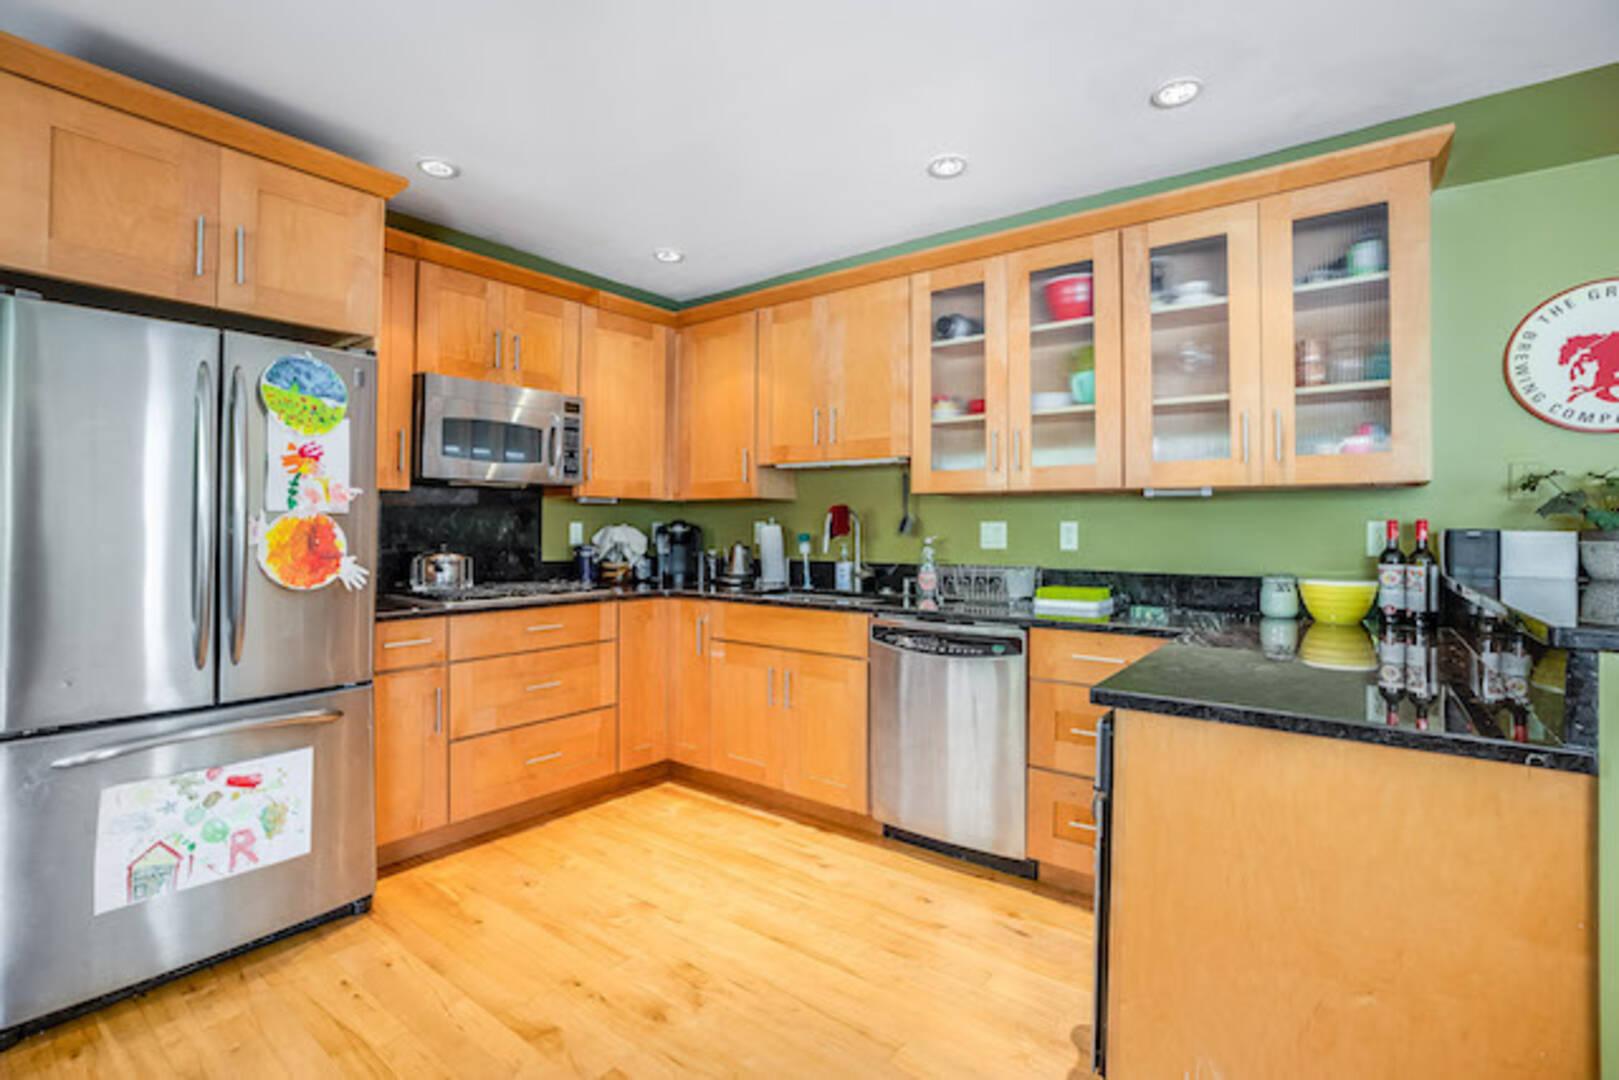 504 Columbia Avenue Units A & B Whitefish, MT 59937